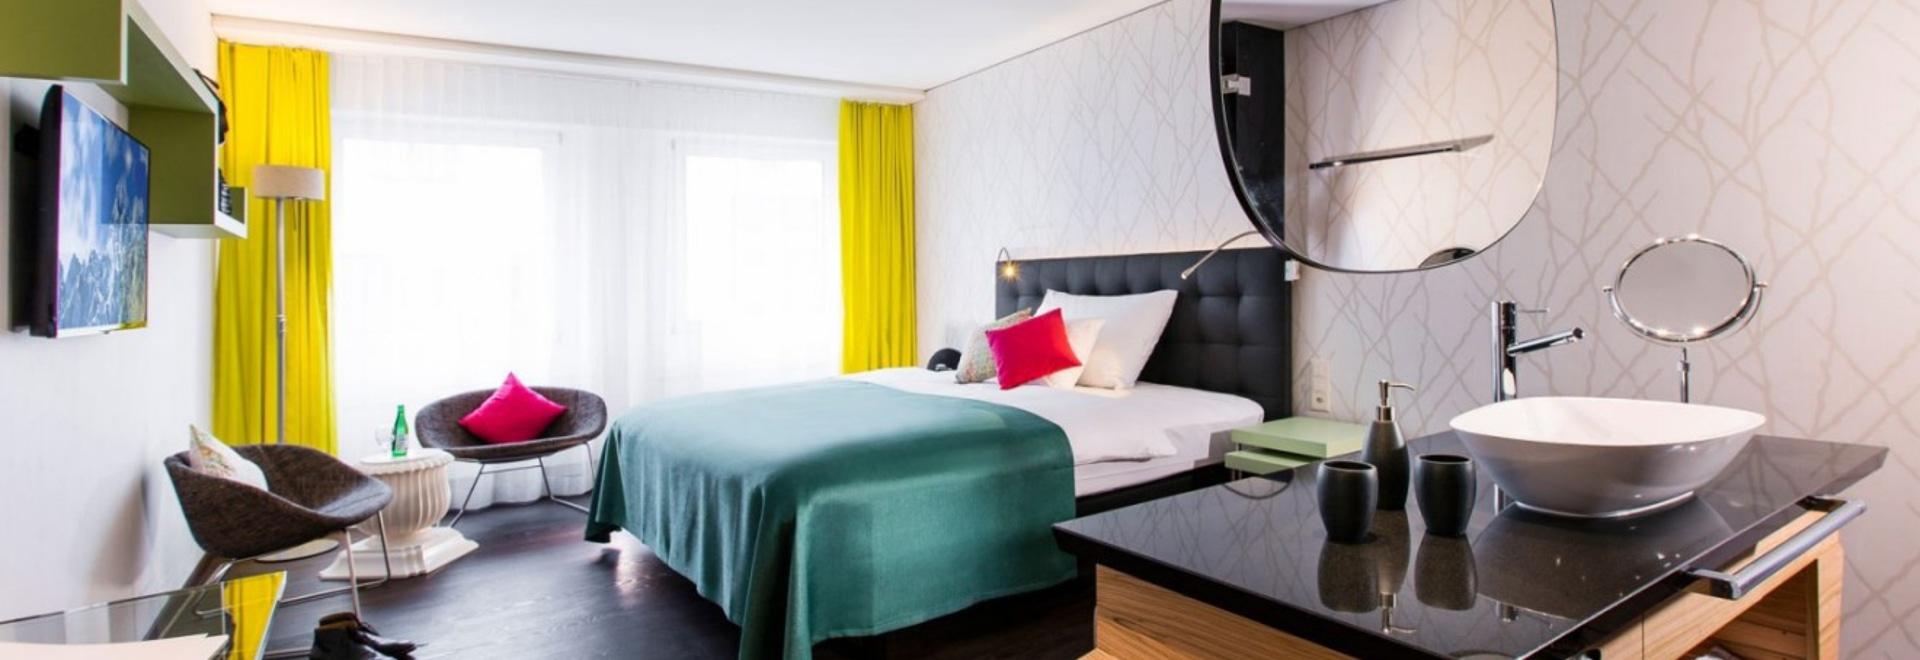 Sanitaires- Hotel Arte Suisse, Olten FRANKE Water System